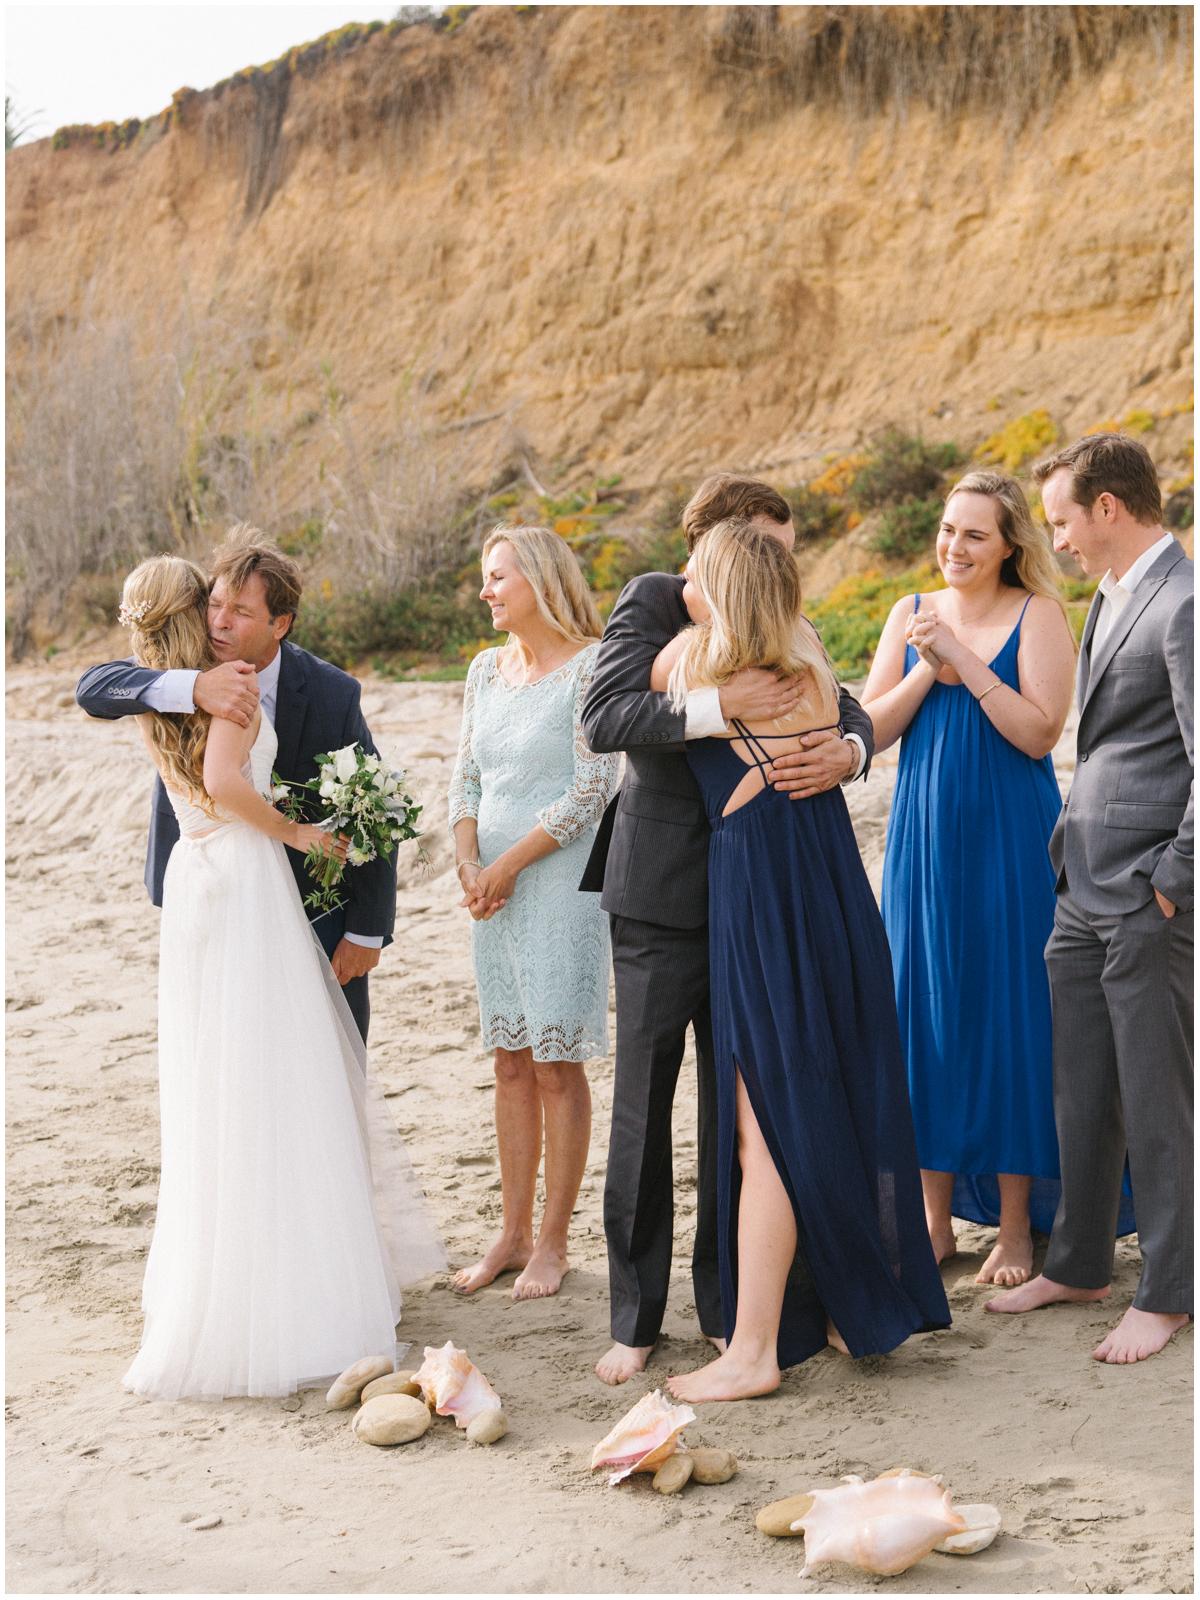 Santa Babara Elopement Wedding Photographer - Pinnel Photography-01-22.jpg